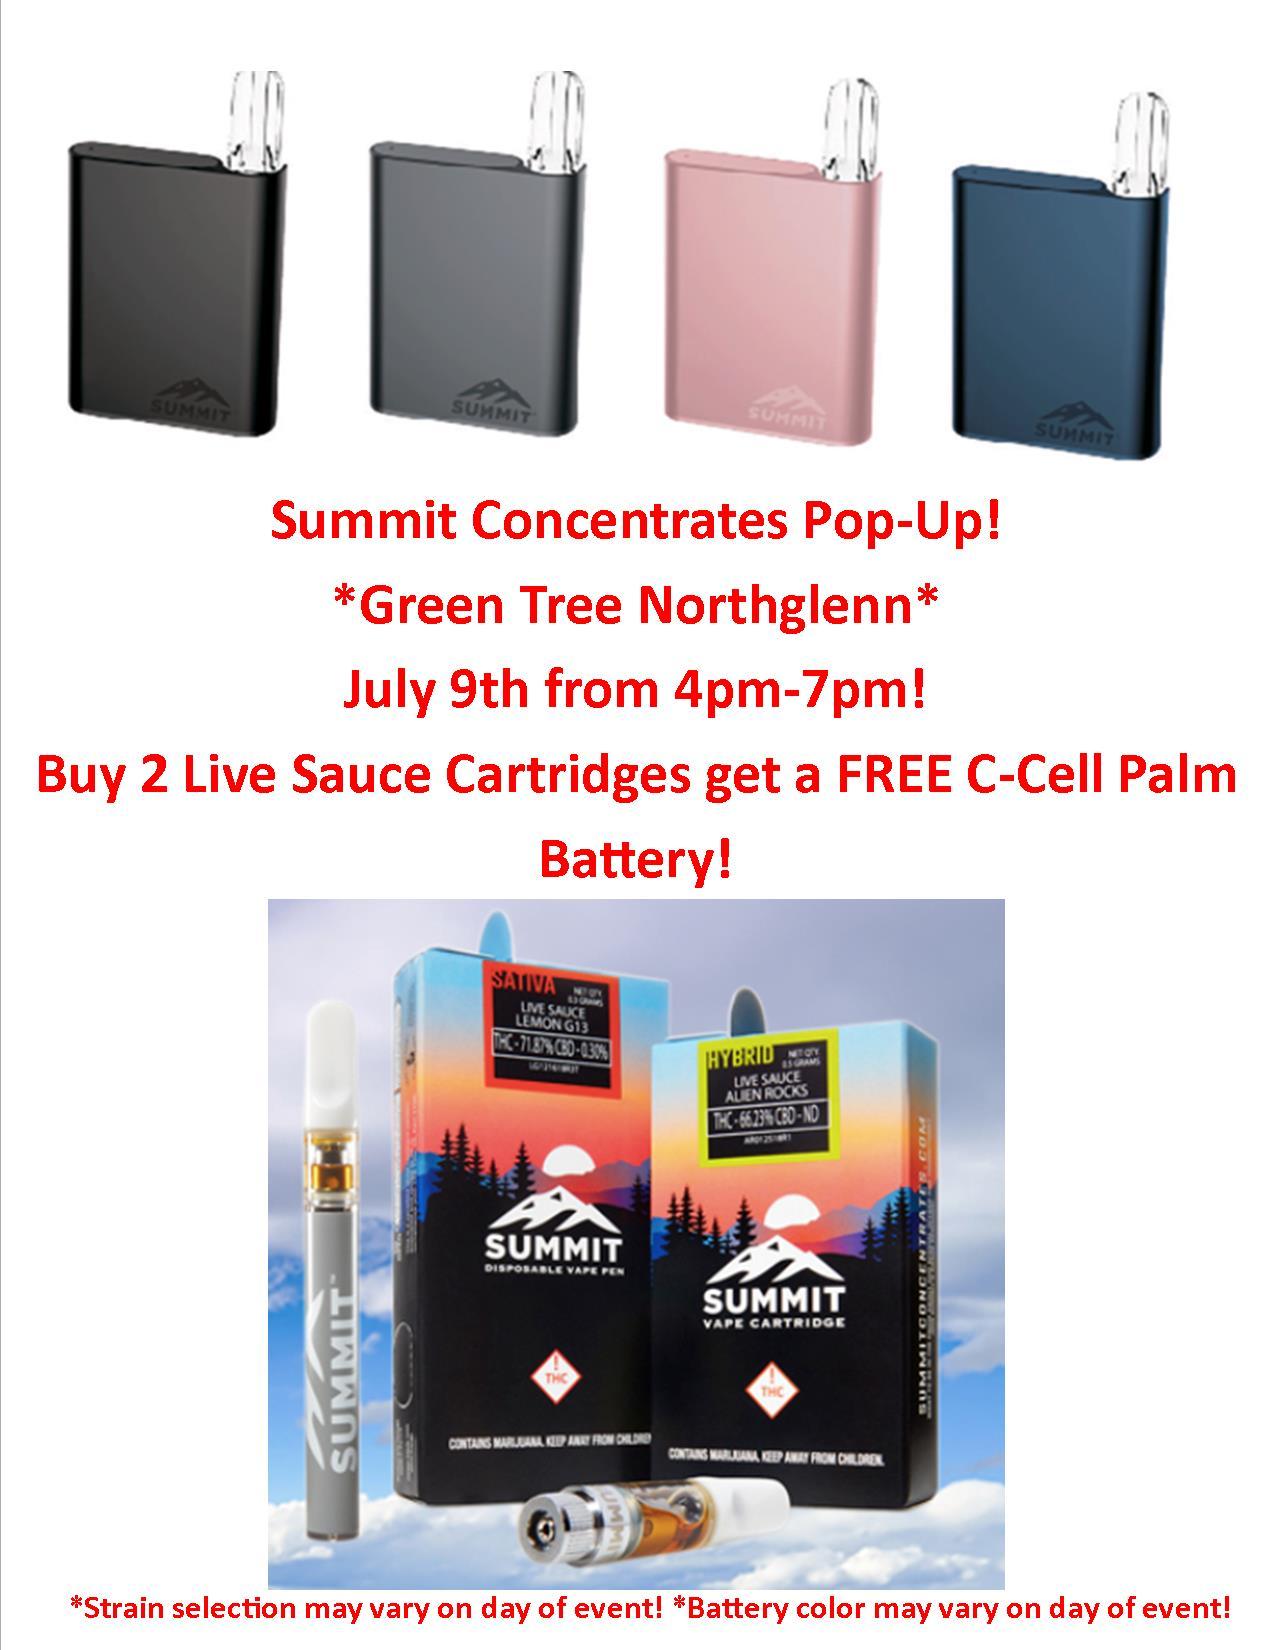 Summit Concentrates Pop Up -Northglenn - Green Tree Medicinals